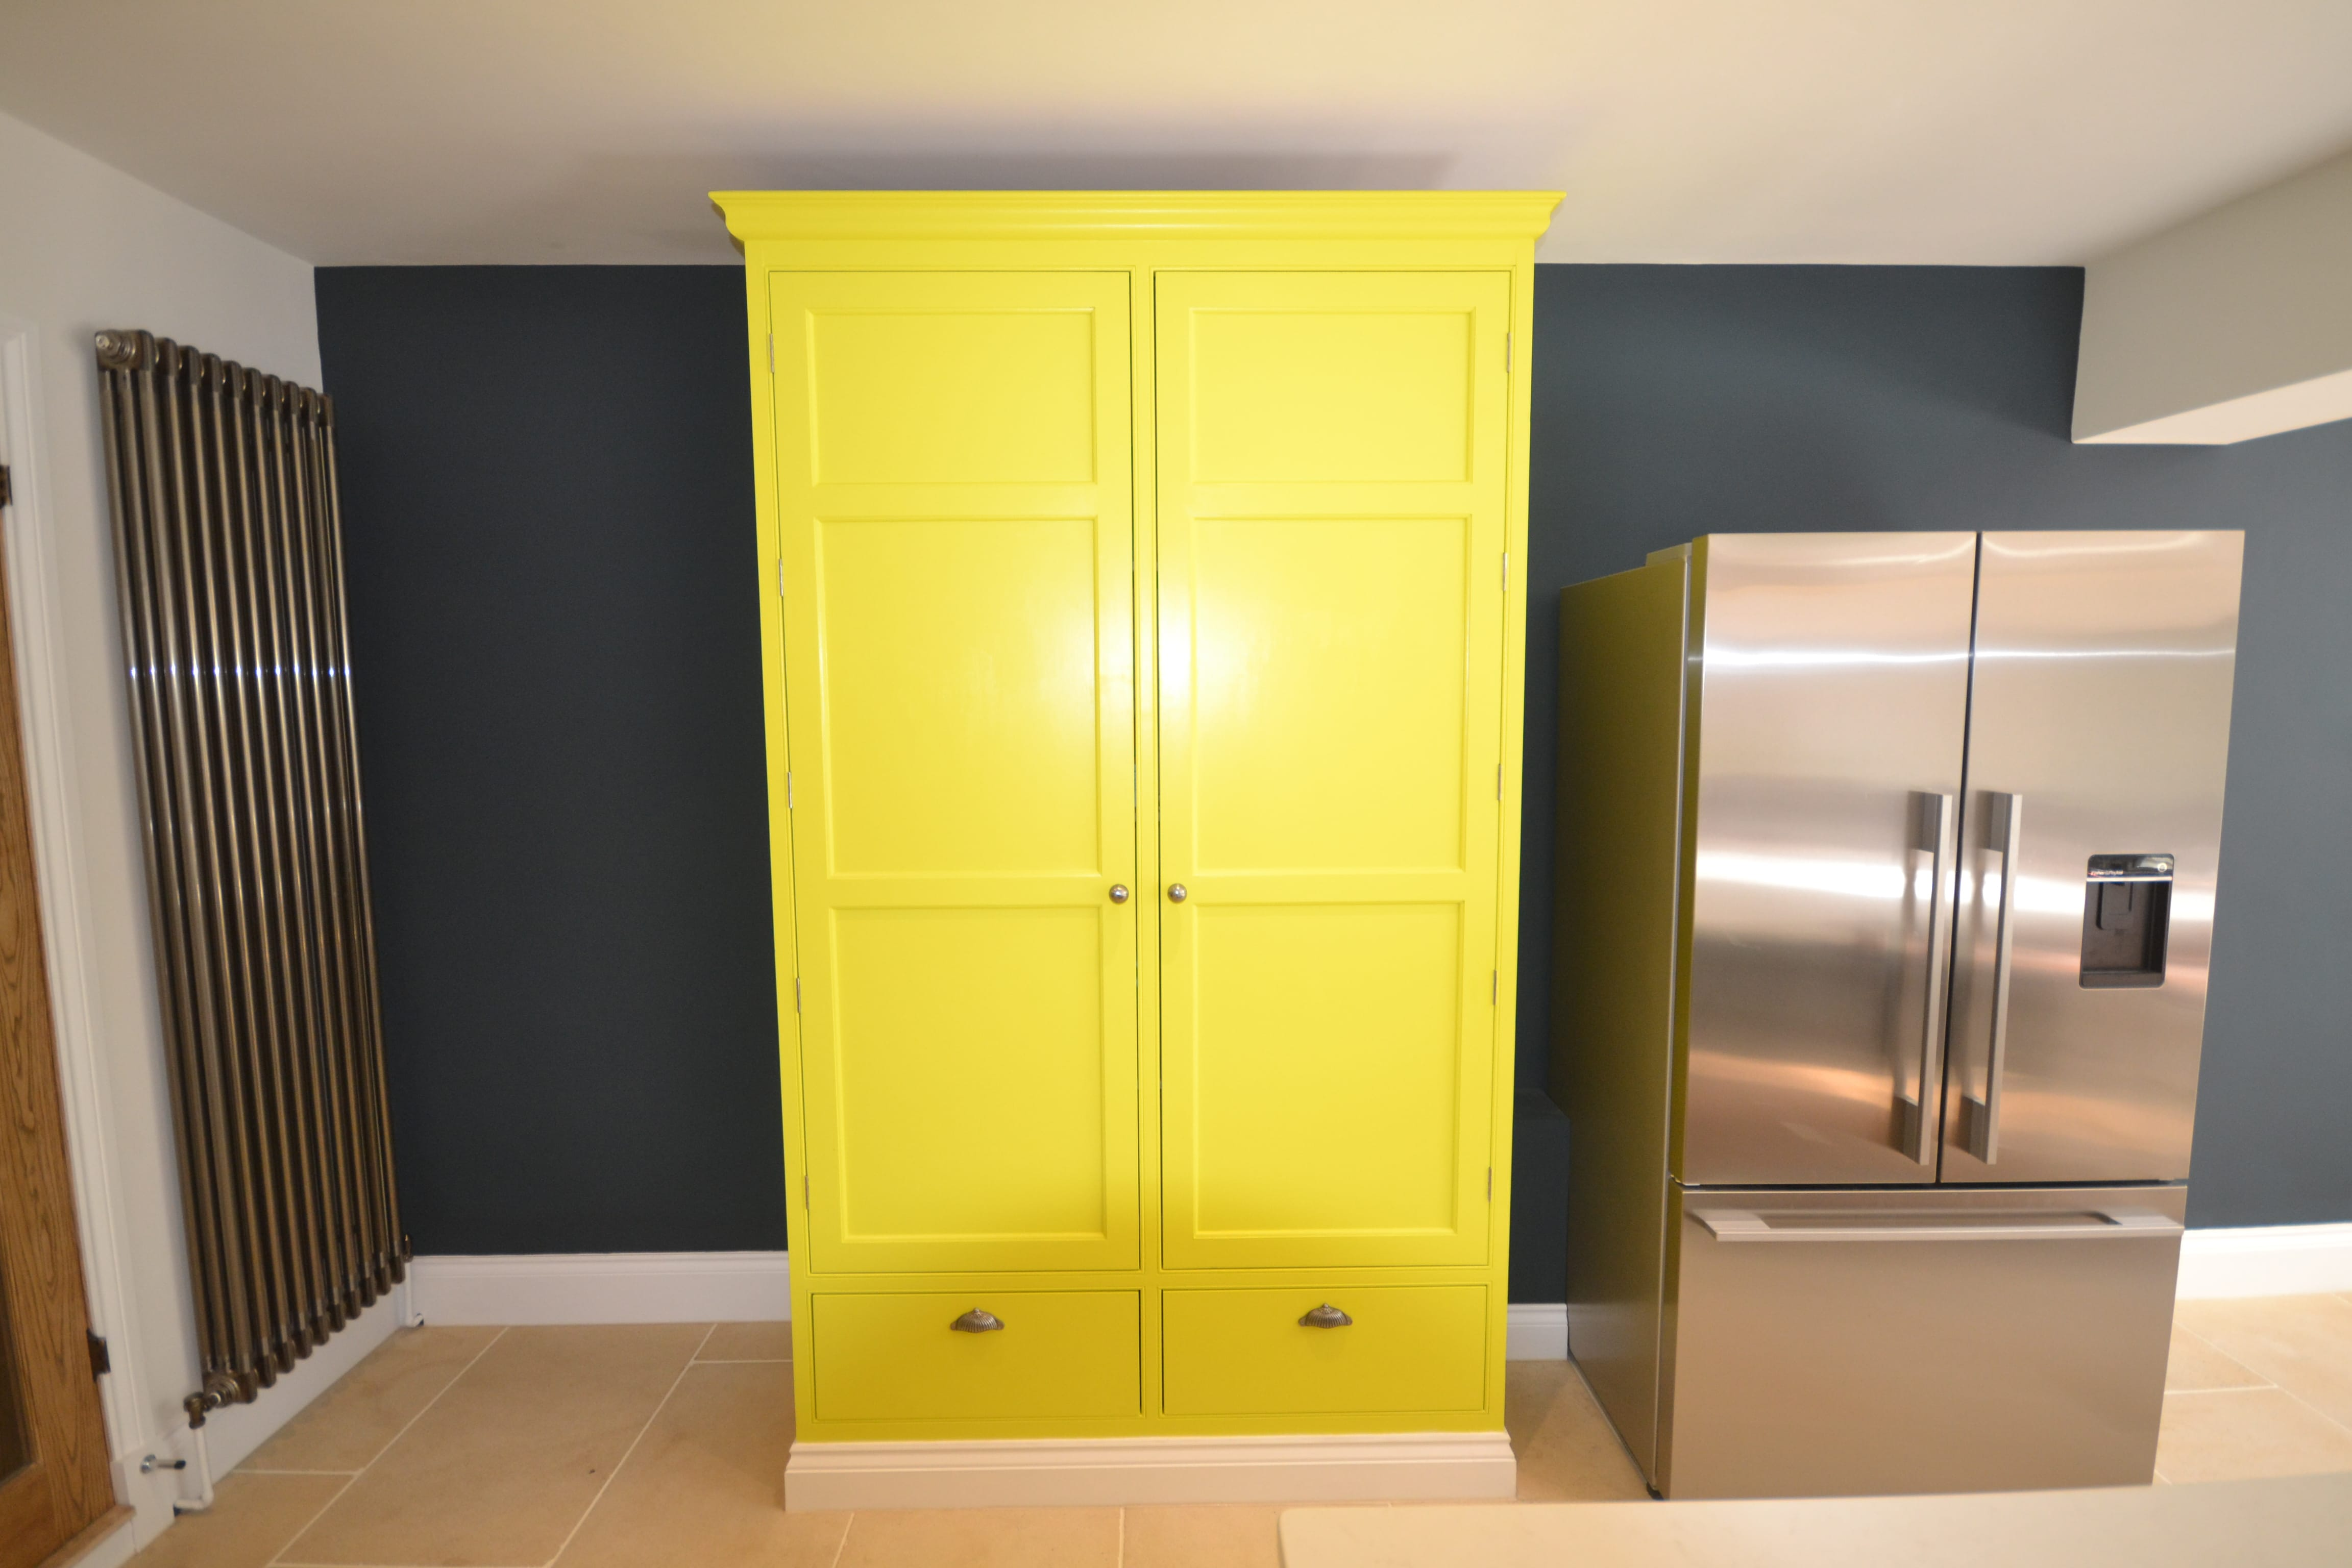 Jla joinery bespoke cabinets dressers for Bespoke kitchen cabinets